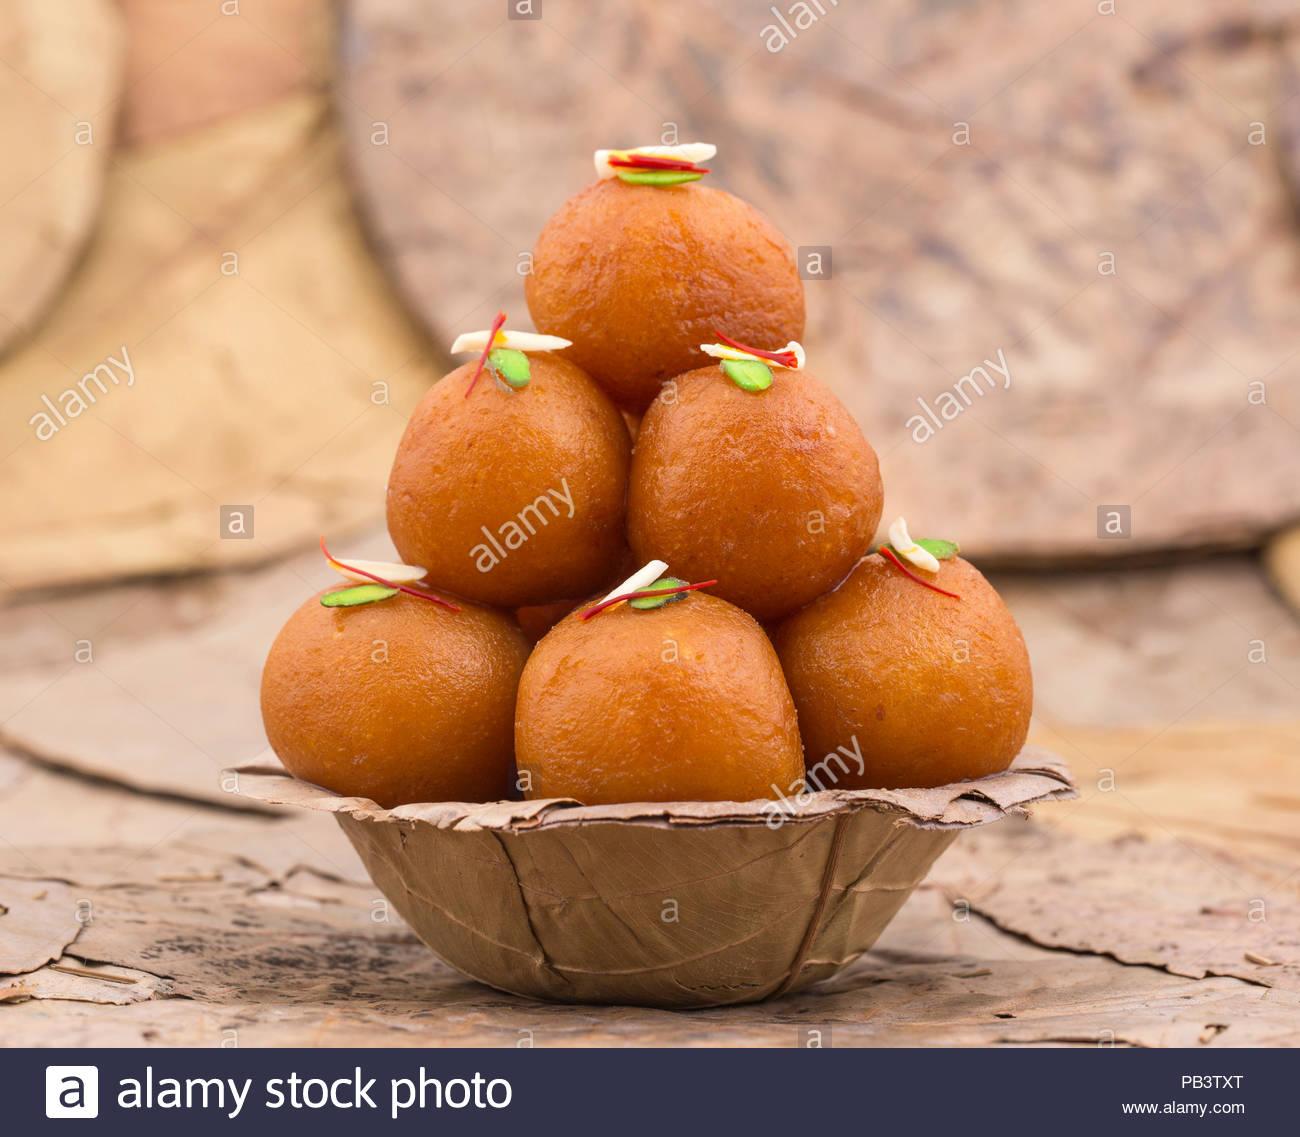 Indian Traditional Dessert Gulab Jamun Stock Photo Alamy